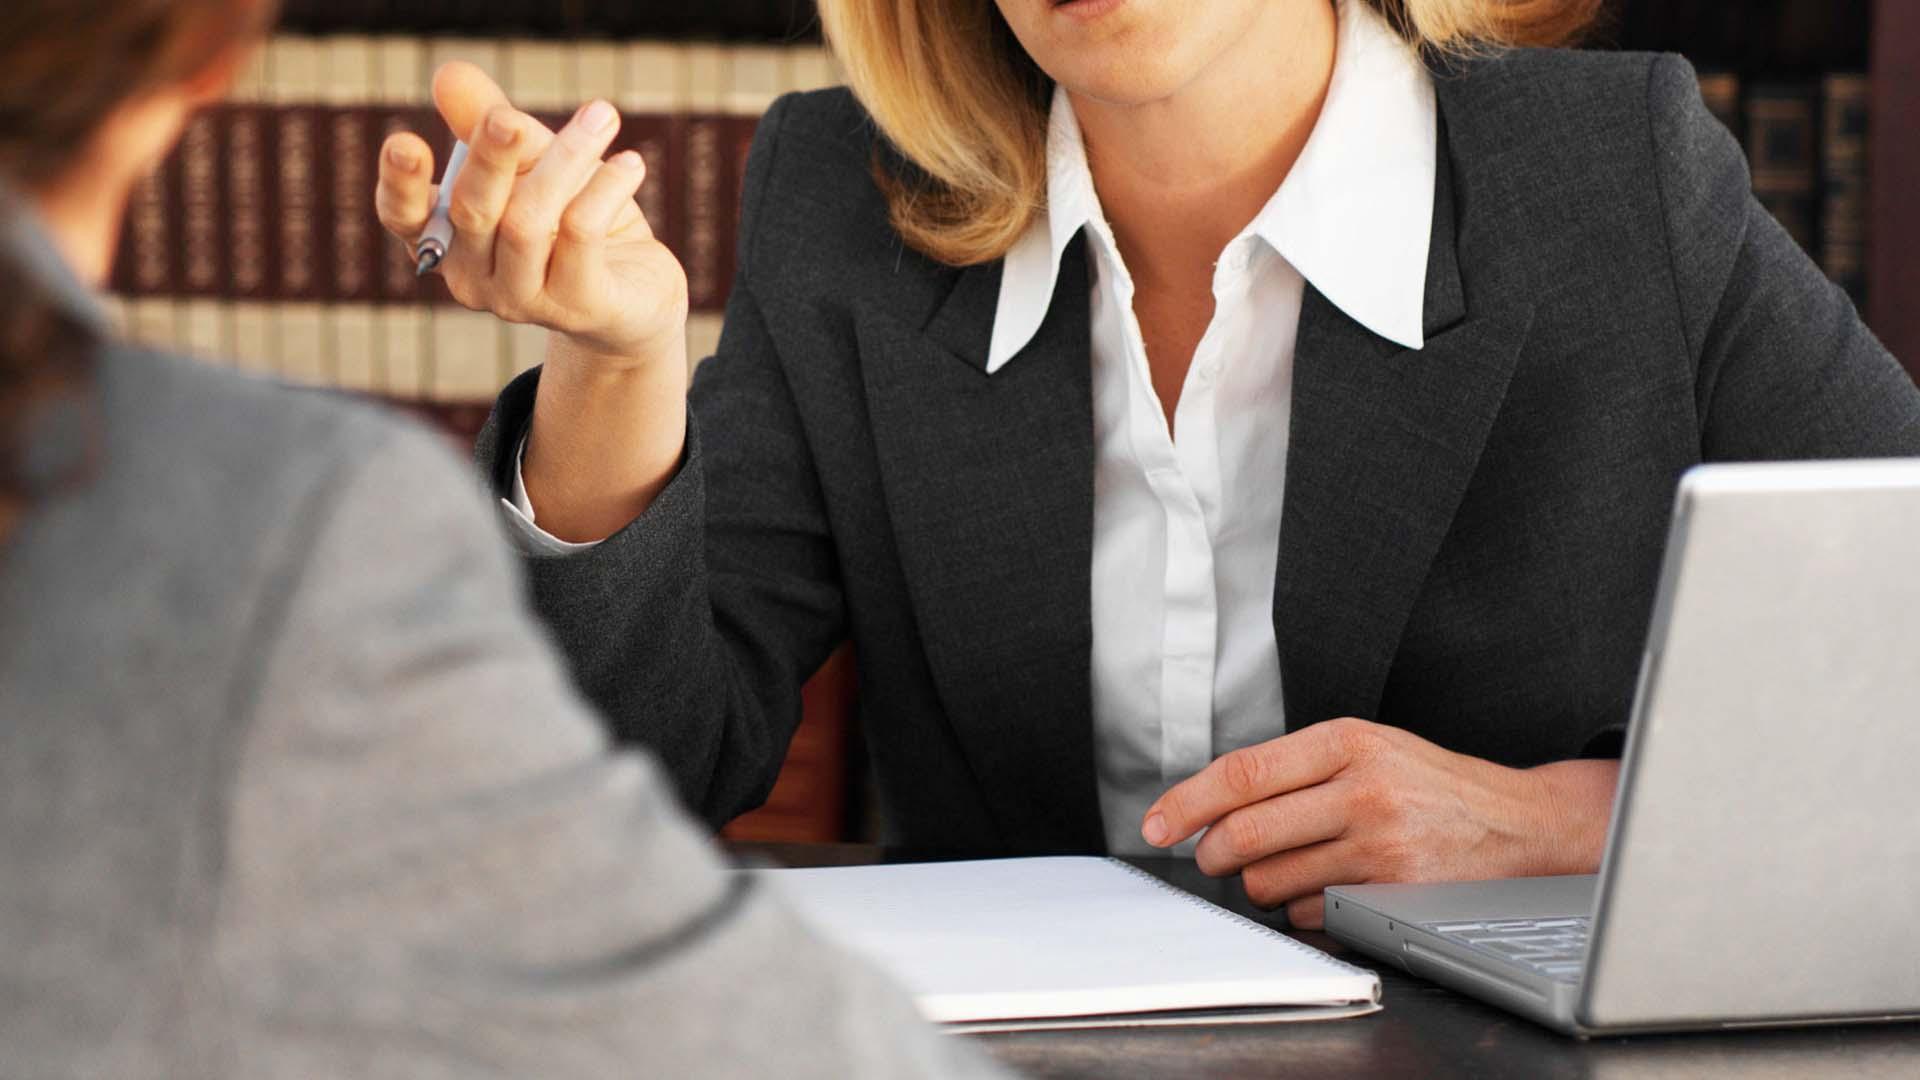 studio-legale-pesaresi-ancona-richiesta-consulenza